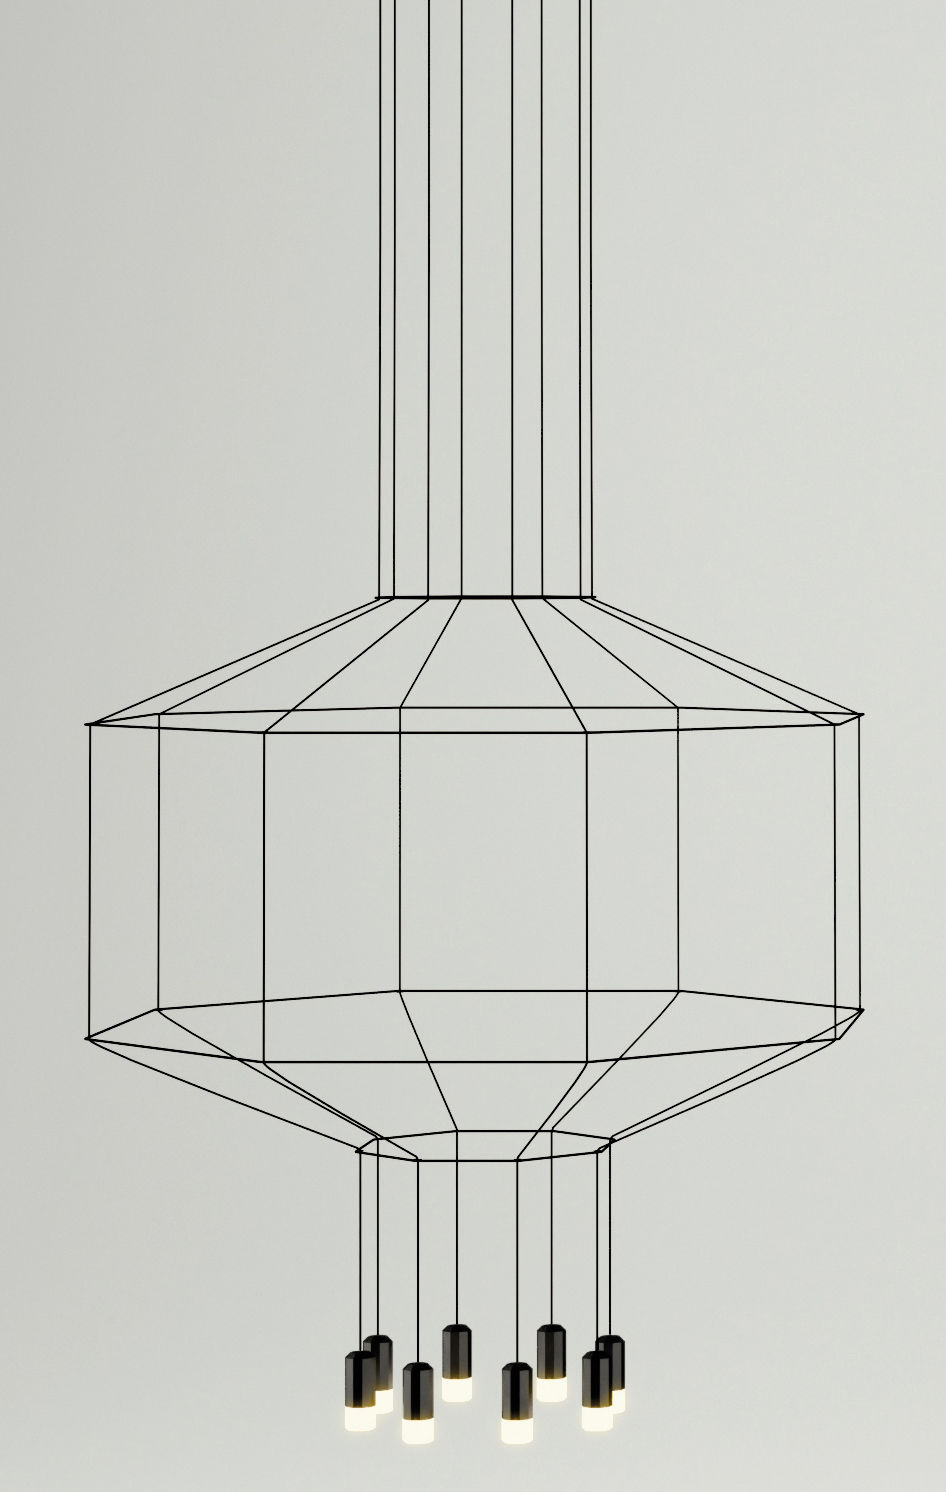 Lighting - Pendant Lighting - Wireflow Pendant by Vibia - Black - Fabric, Glass, Lacquered metal, Teflon